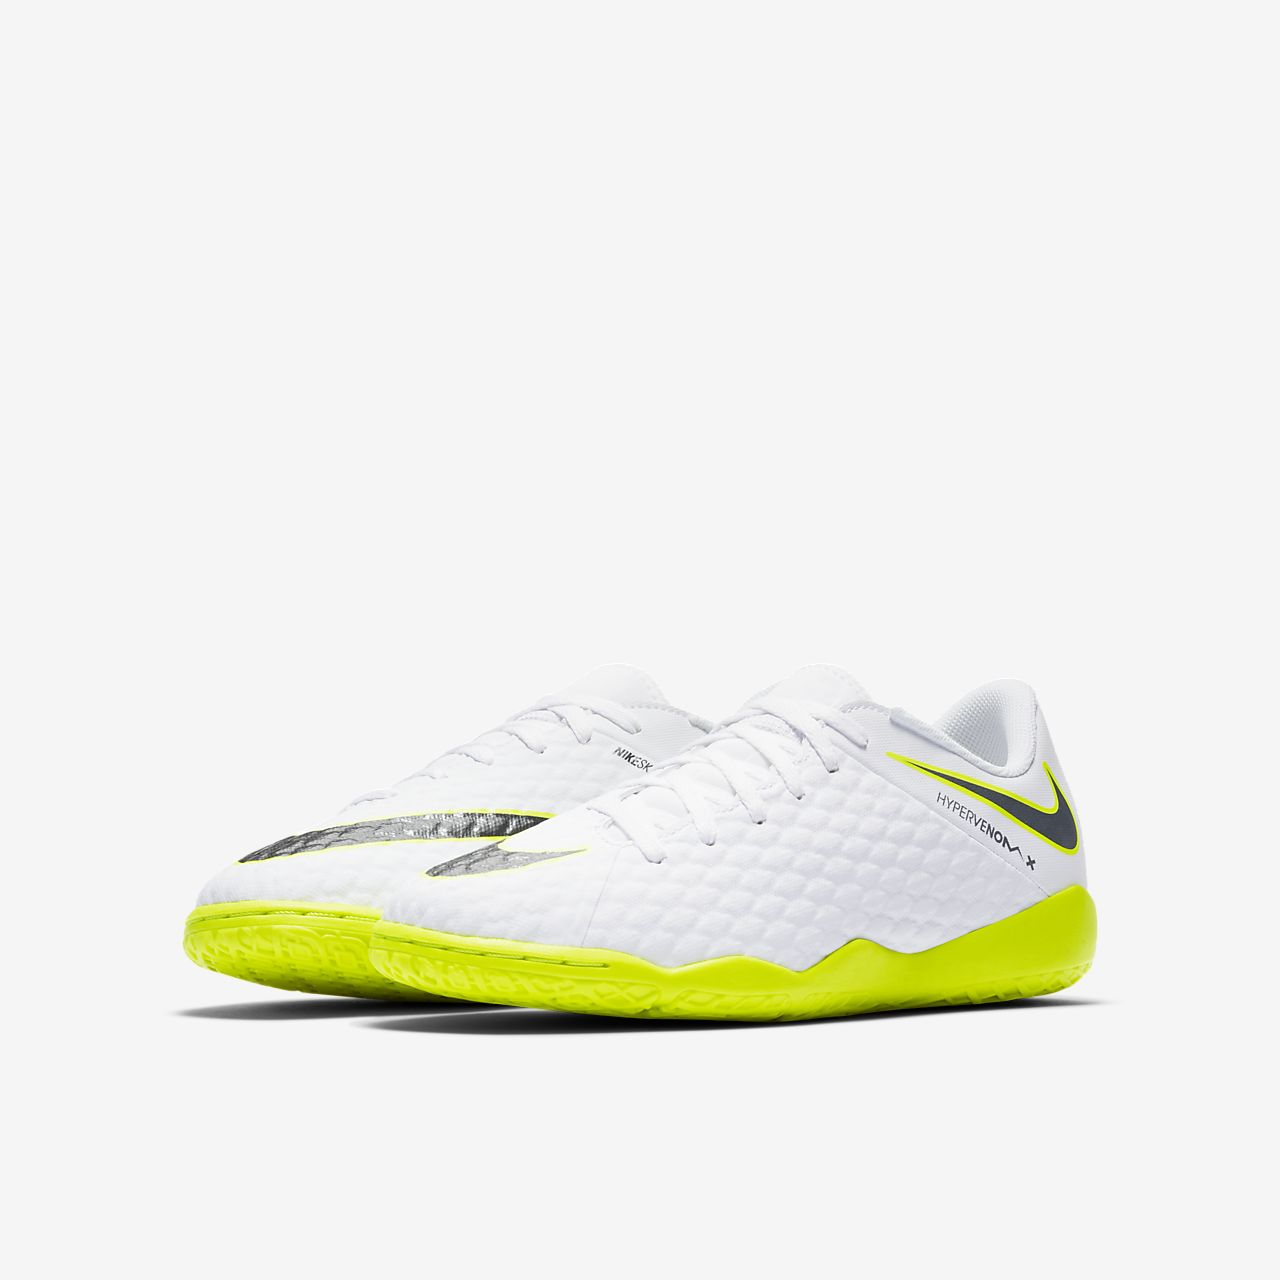 new concept eccfd 860d5 ... Nike Jr. HypervenomX Phantom III Academy Younger Older Kids   Indoor Court Football